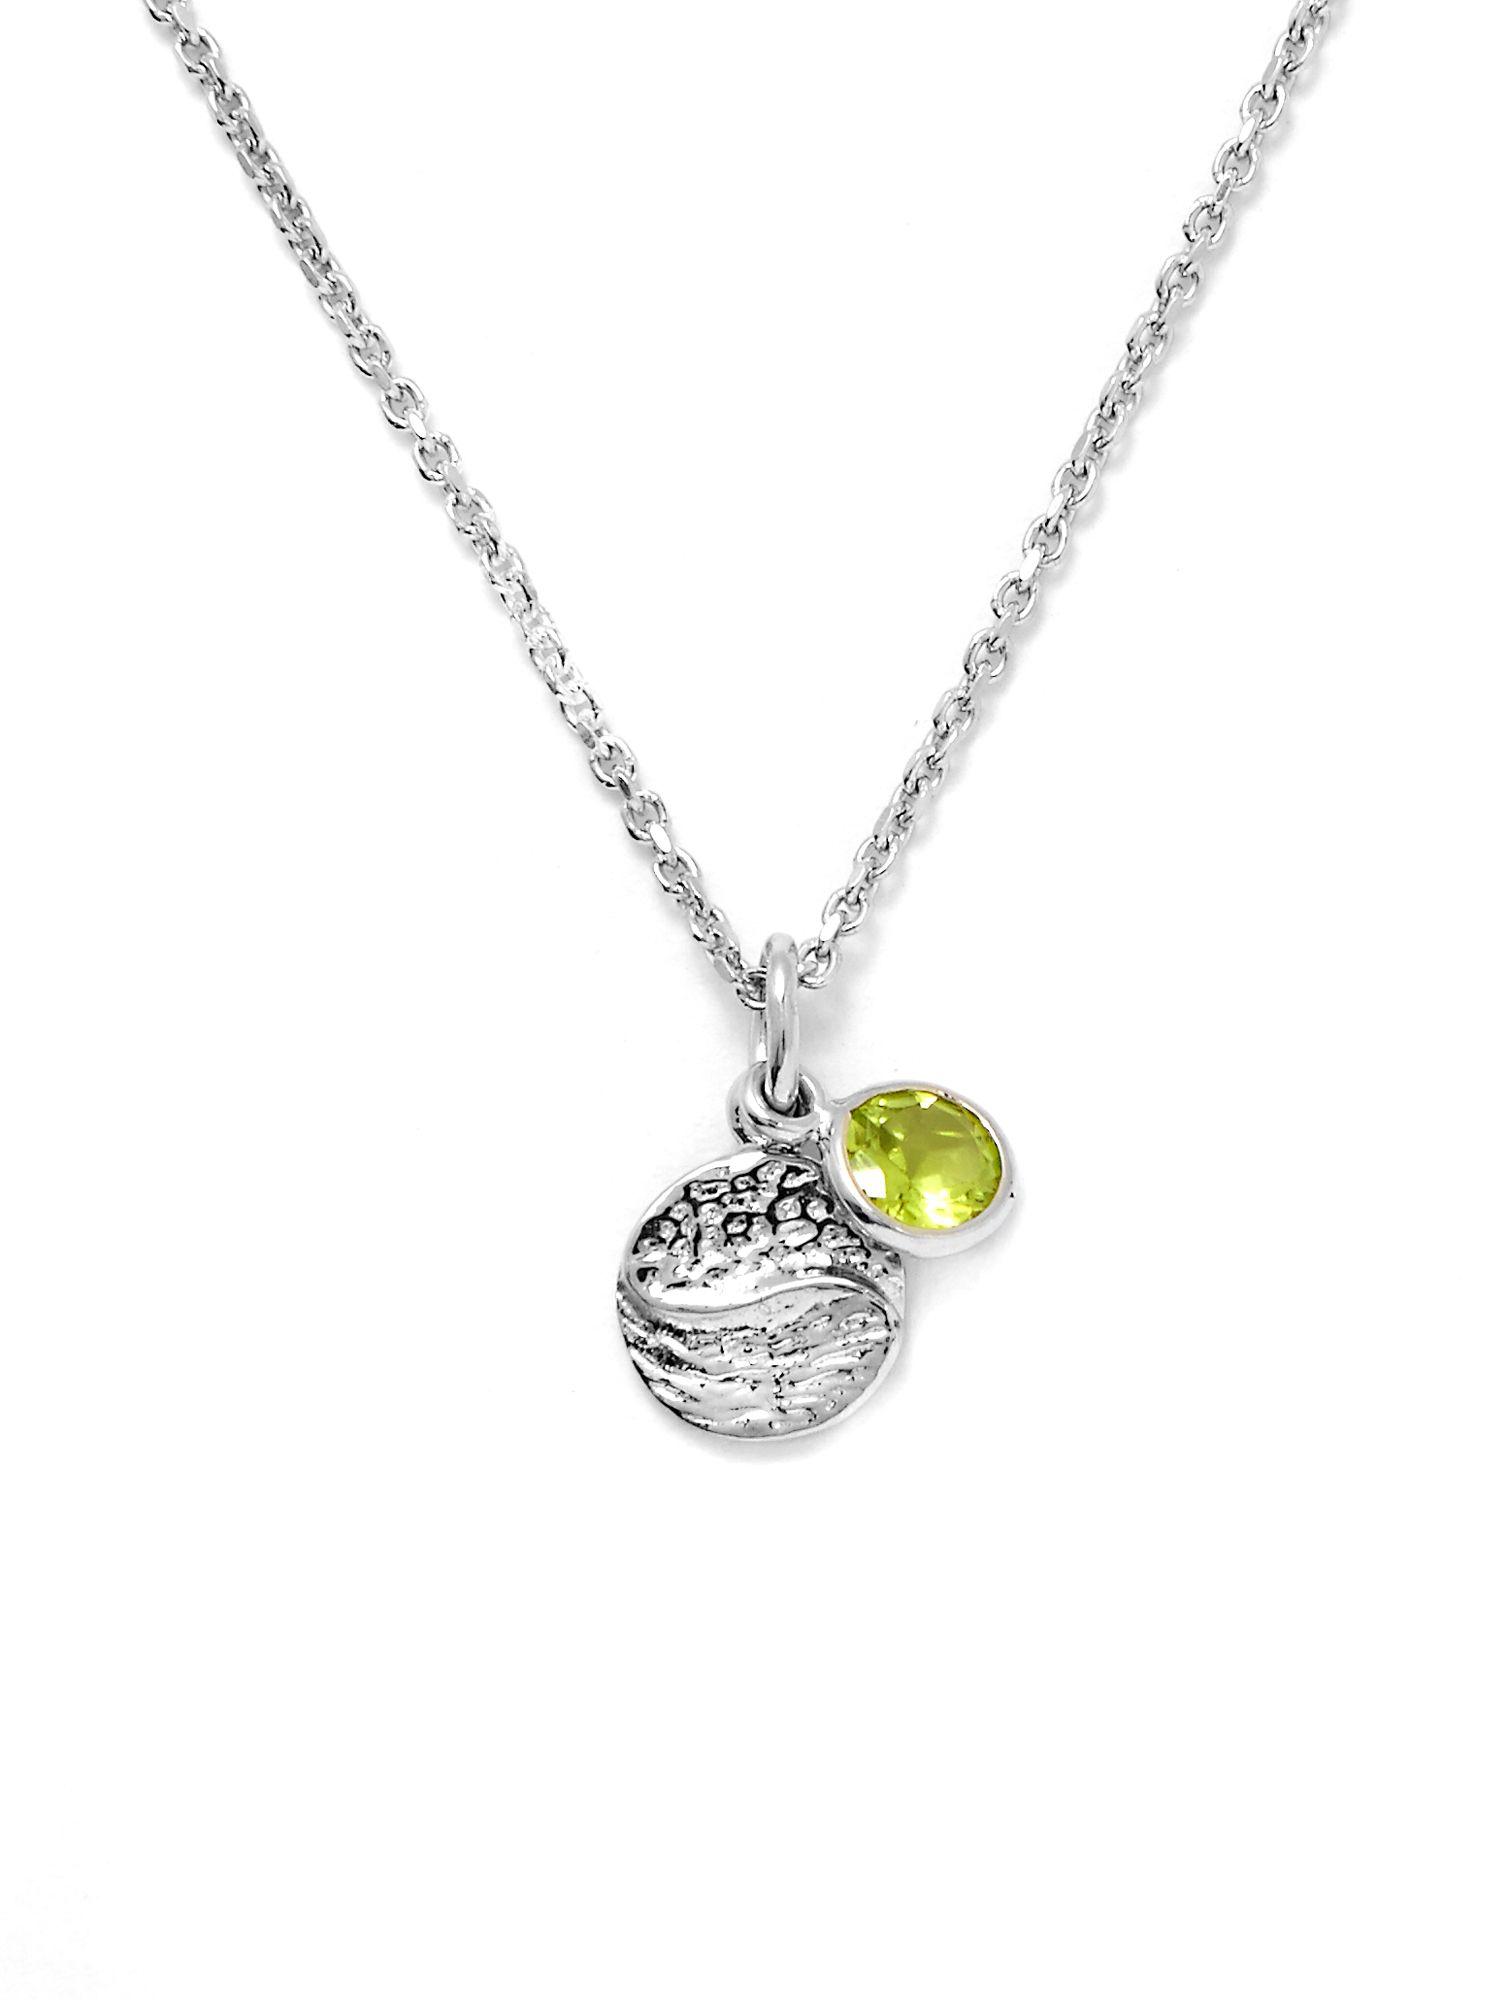 Gemporia Hunan Peridot Sterling Silver Necklace In